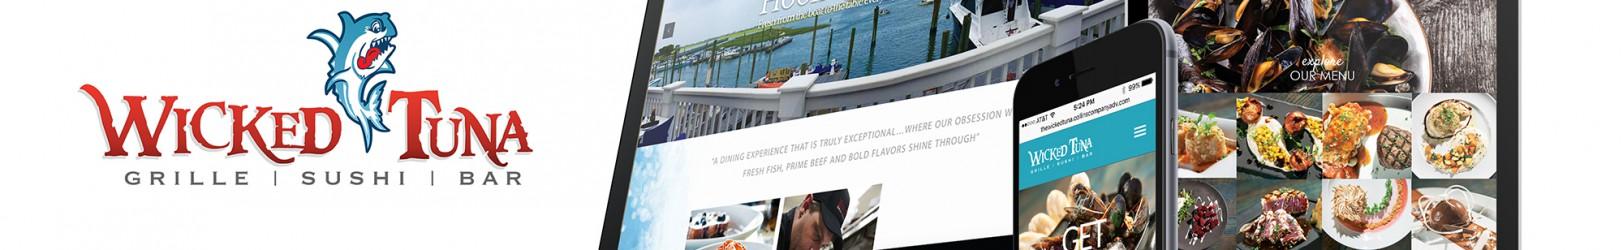 The Wicked Tuna Website